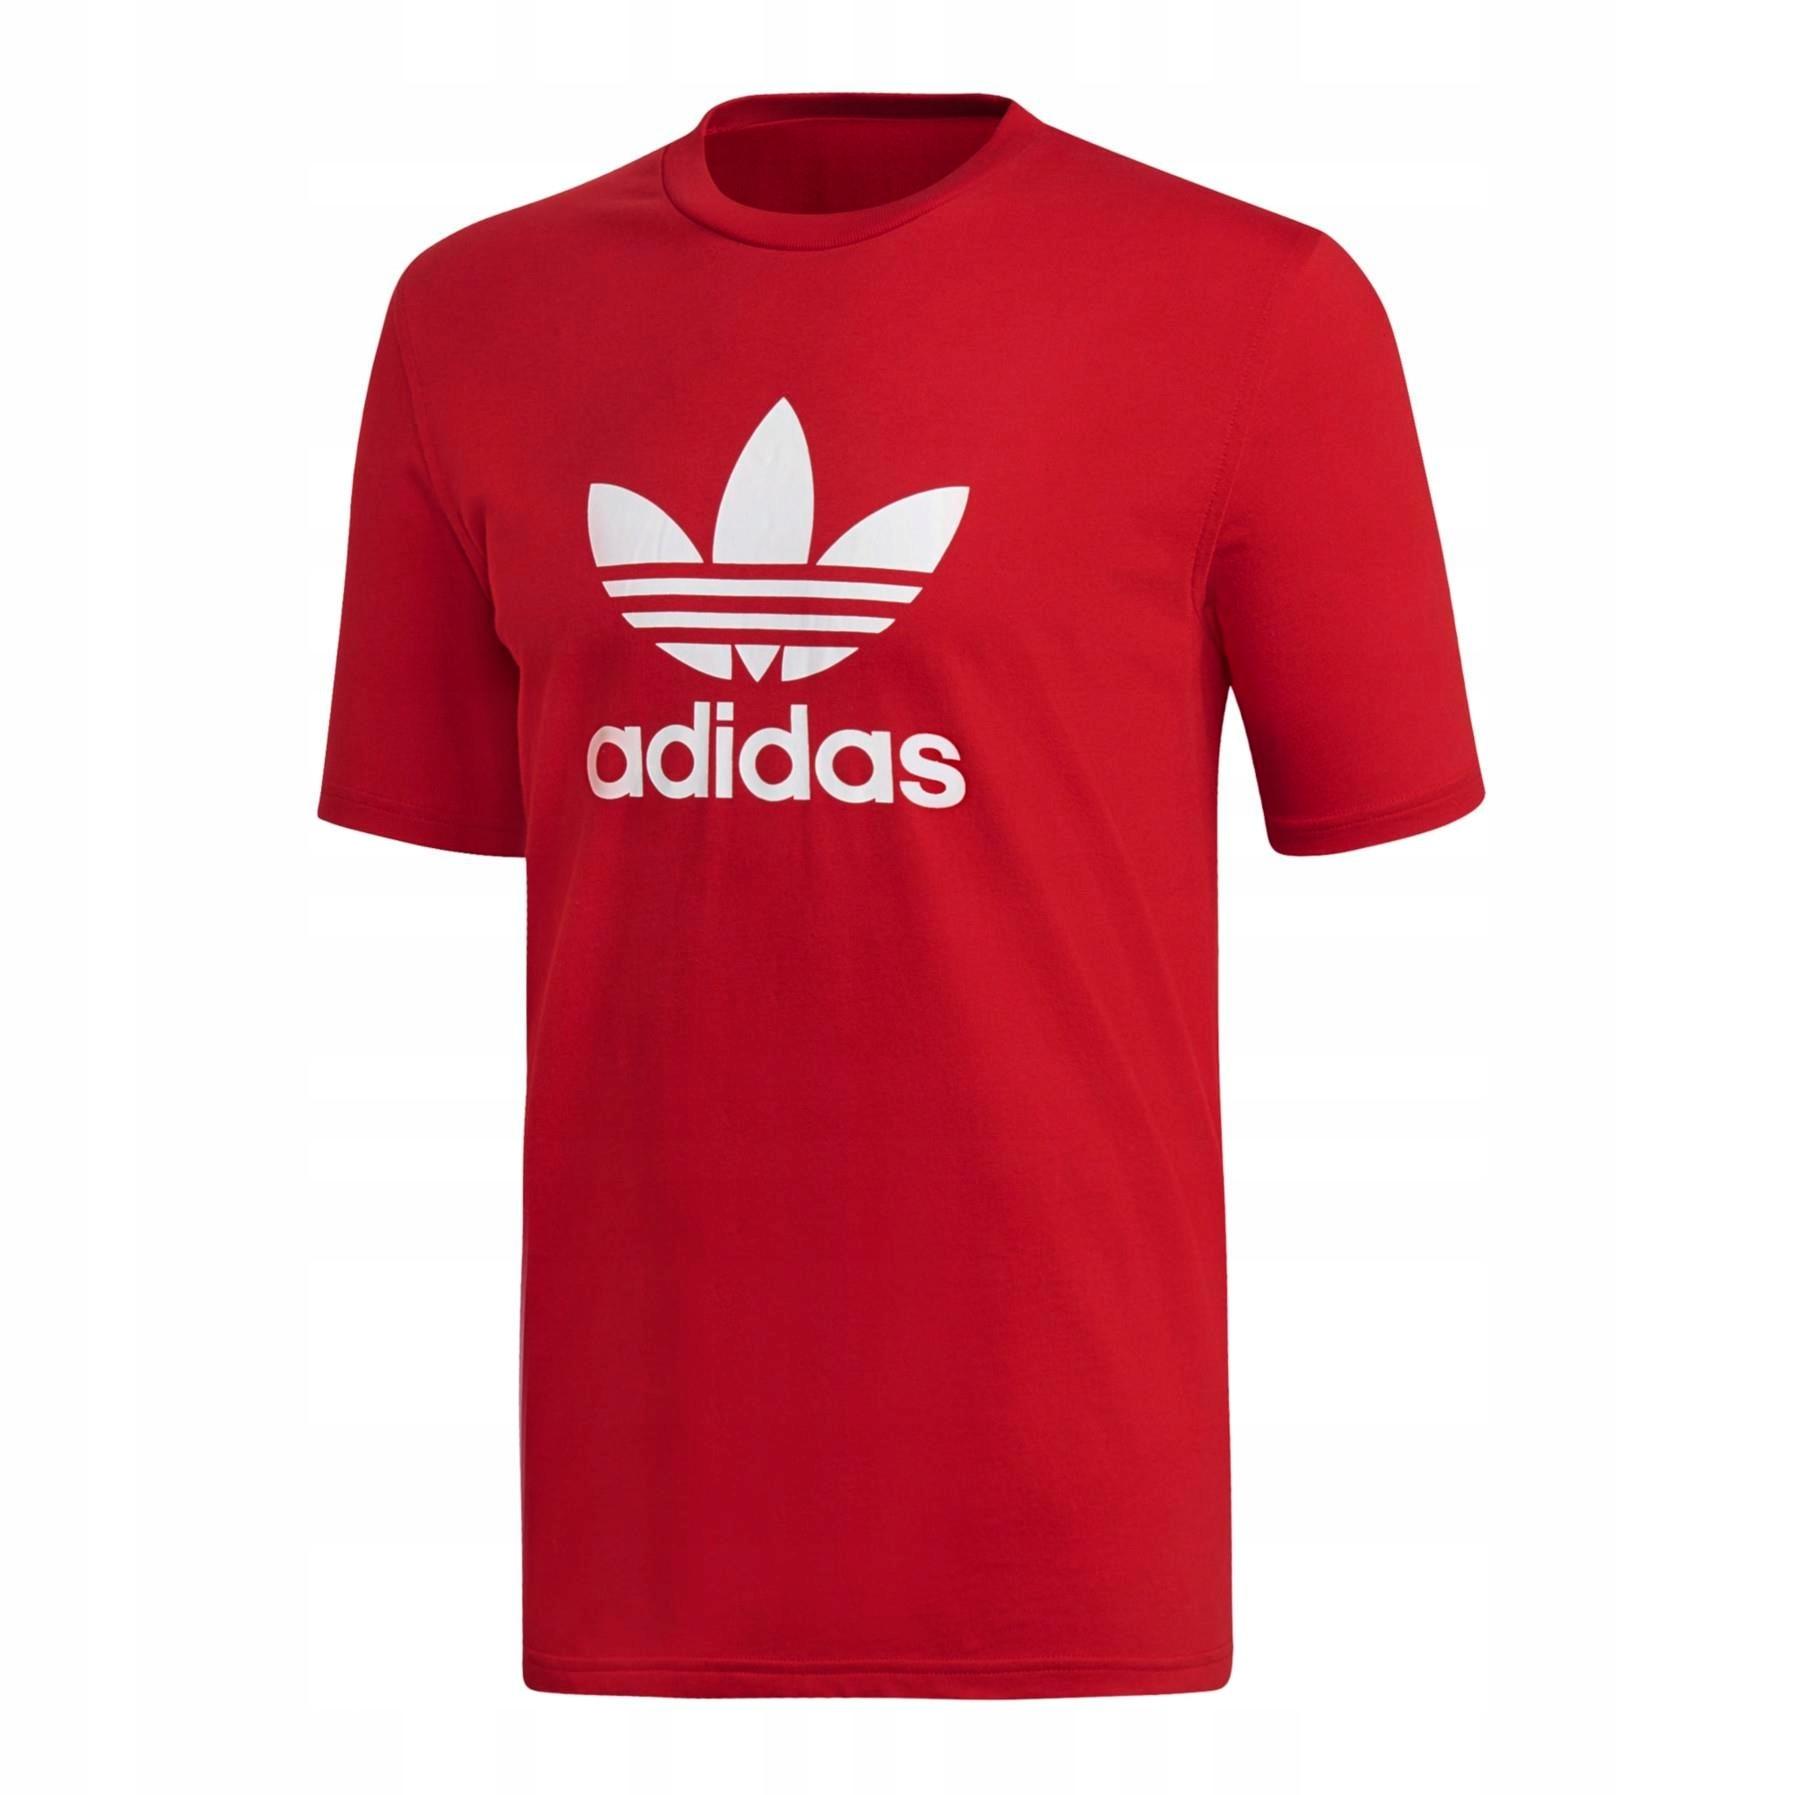 Koszulka adidas Trefoil DX3609 DX3609-a2 r XXL